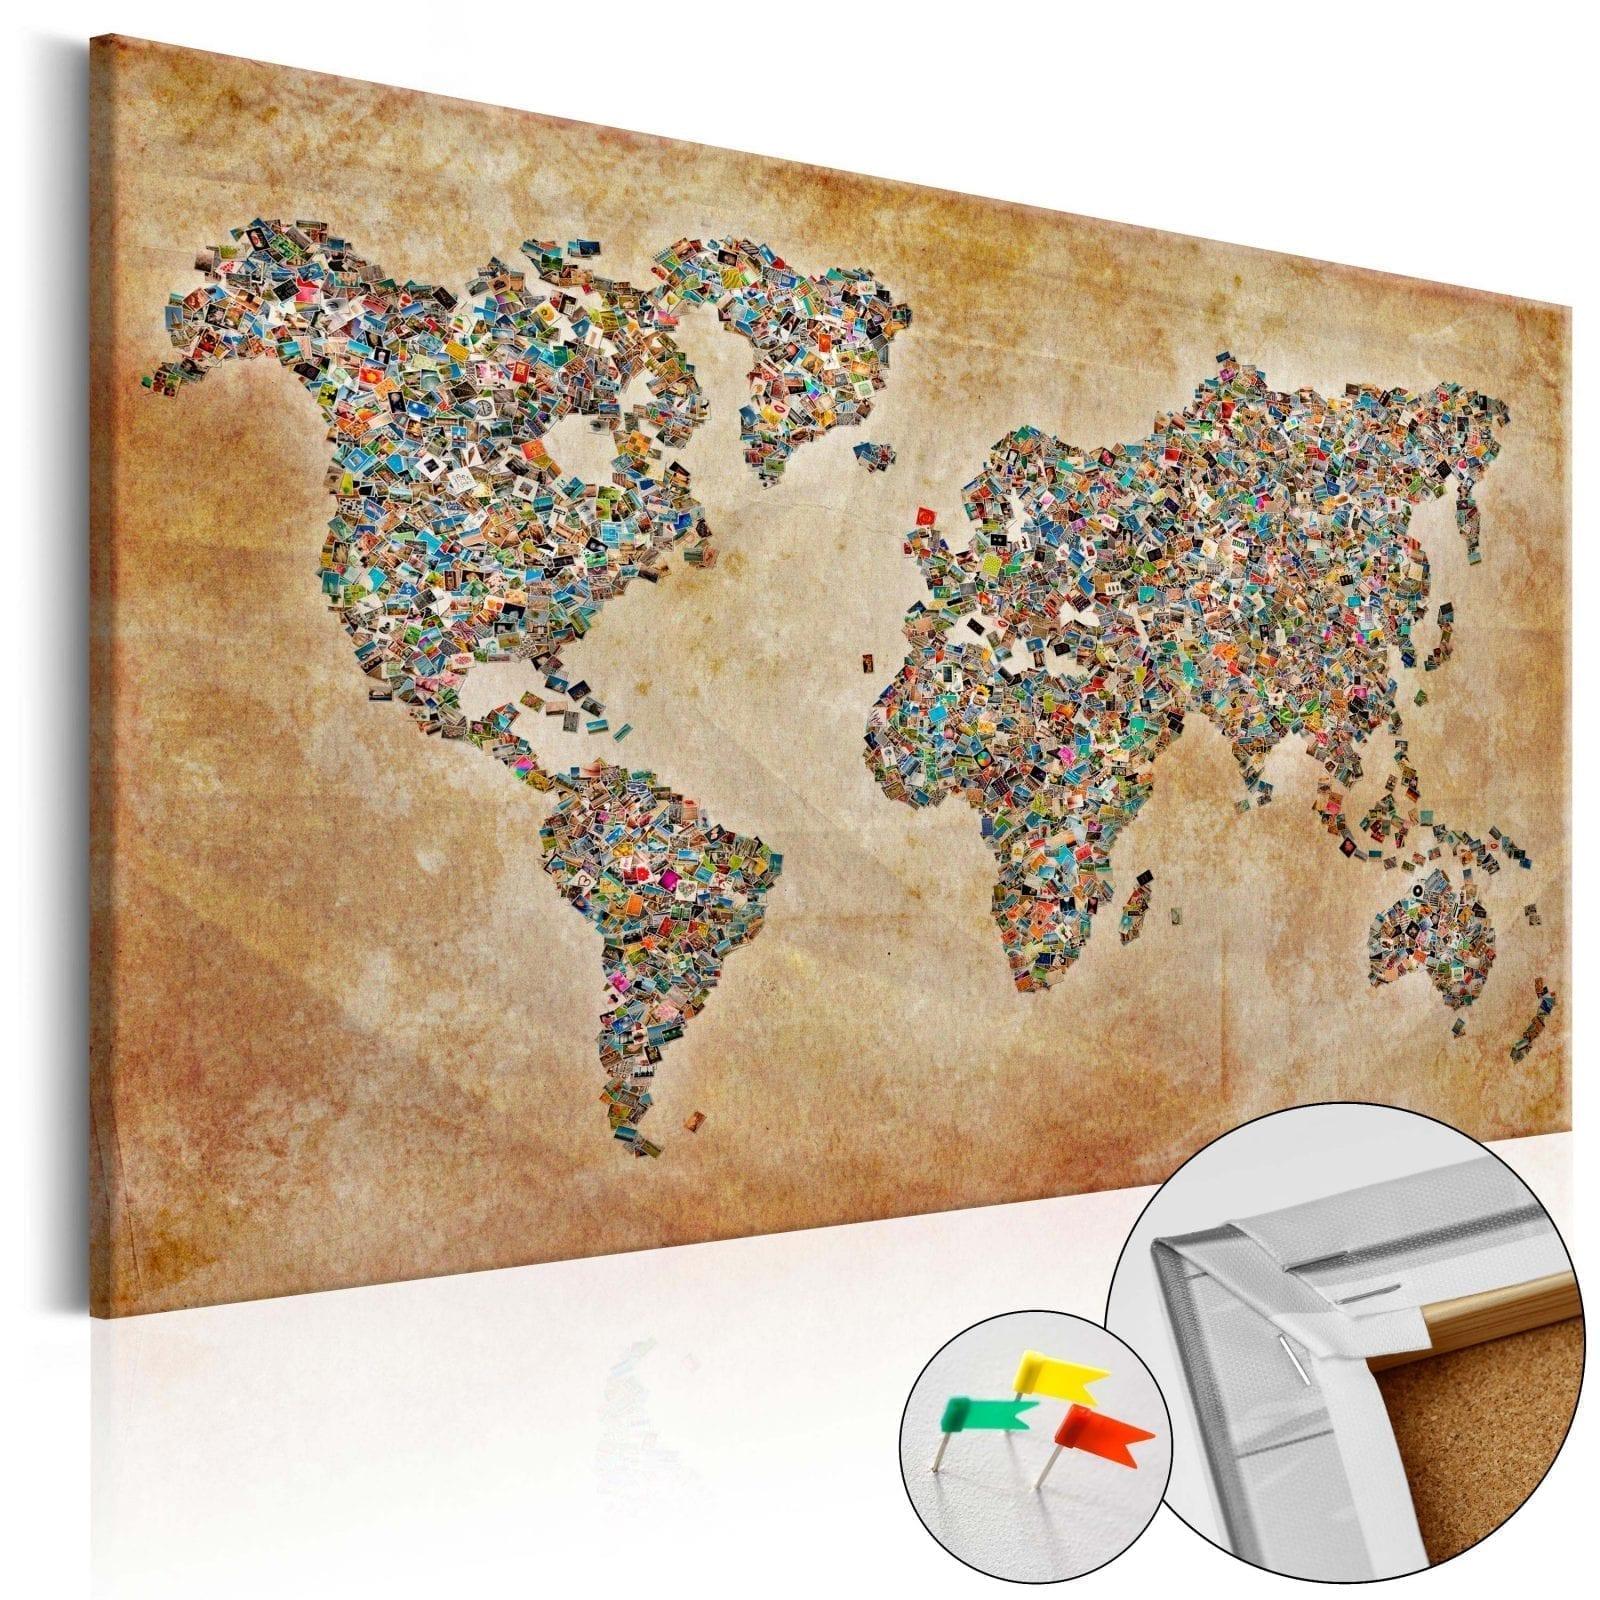 Tablero de corcho - Postcards from the World 1 | Potspintura.com